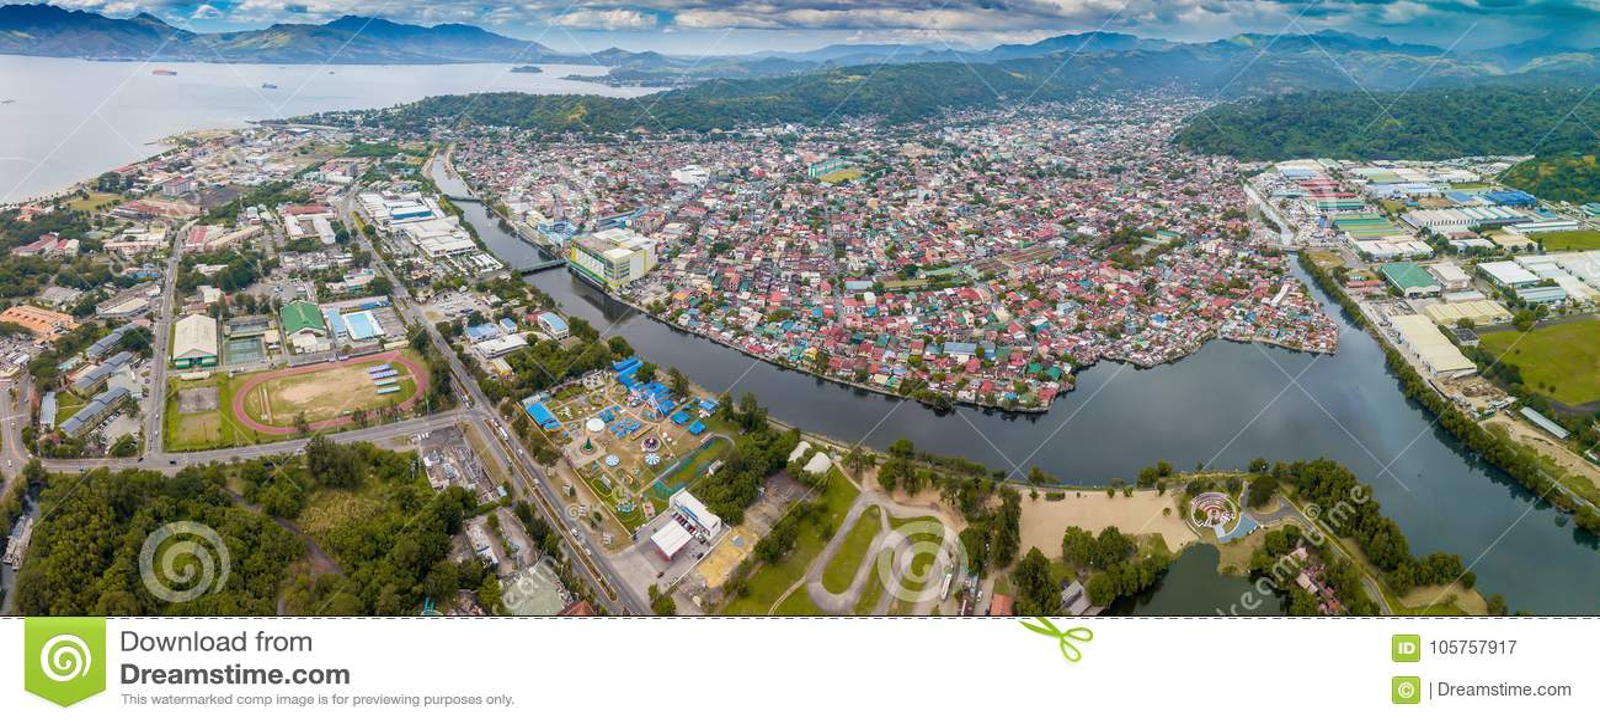 Olongapo miasto w Filipiny